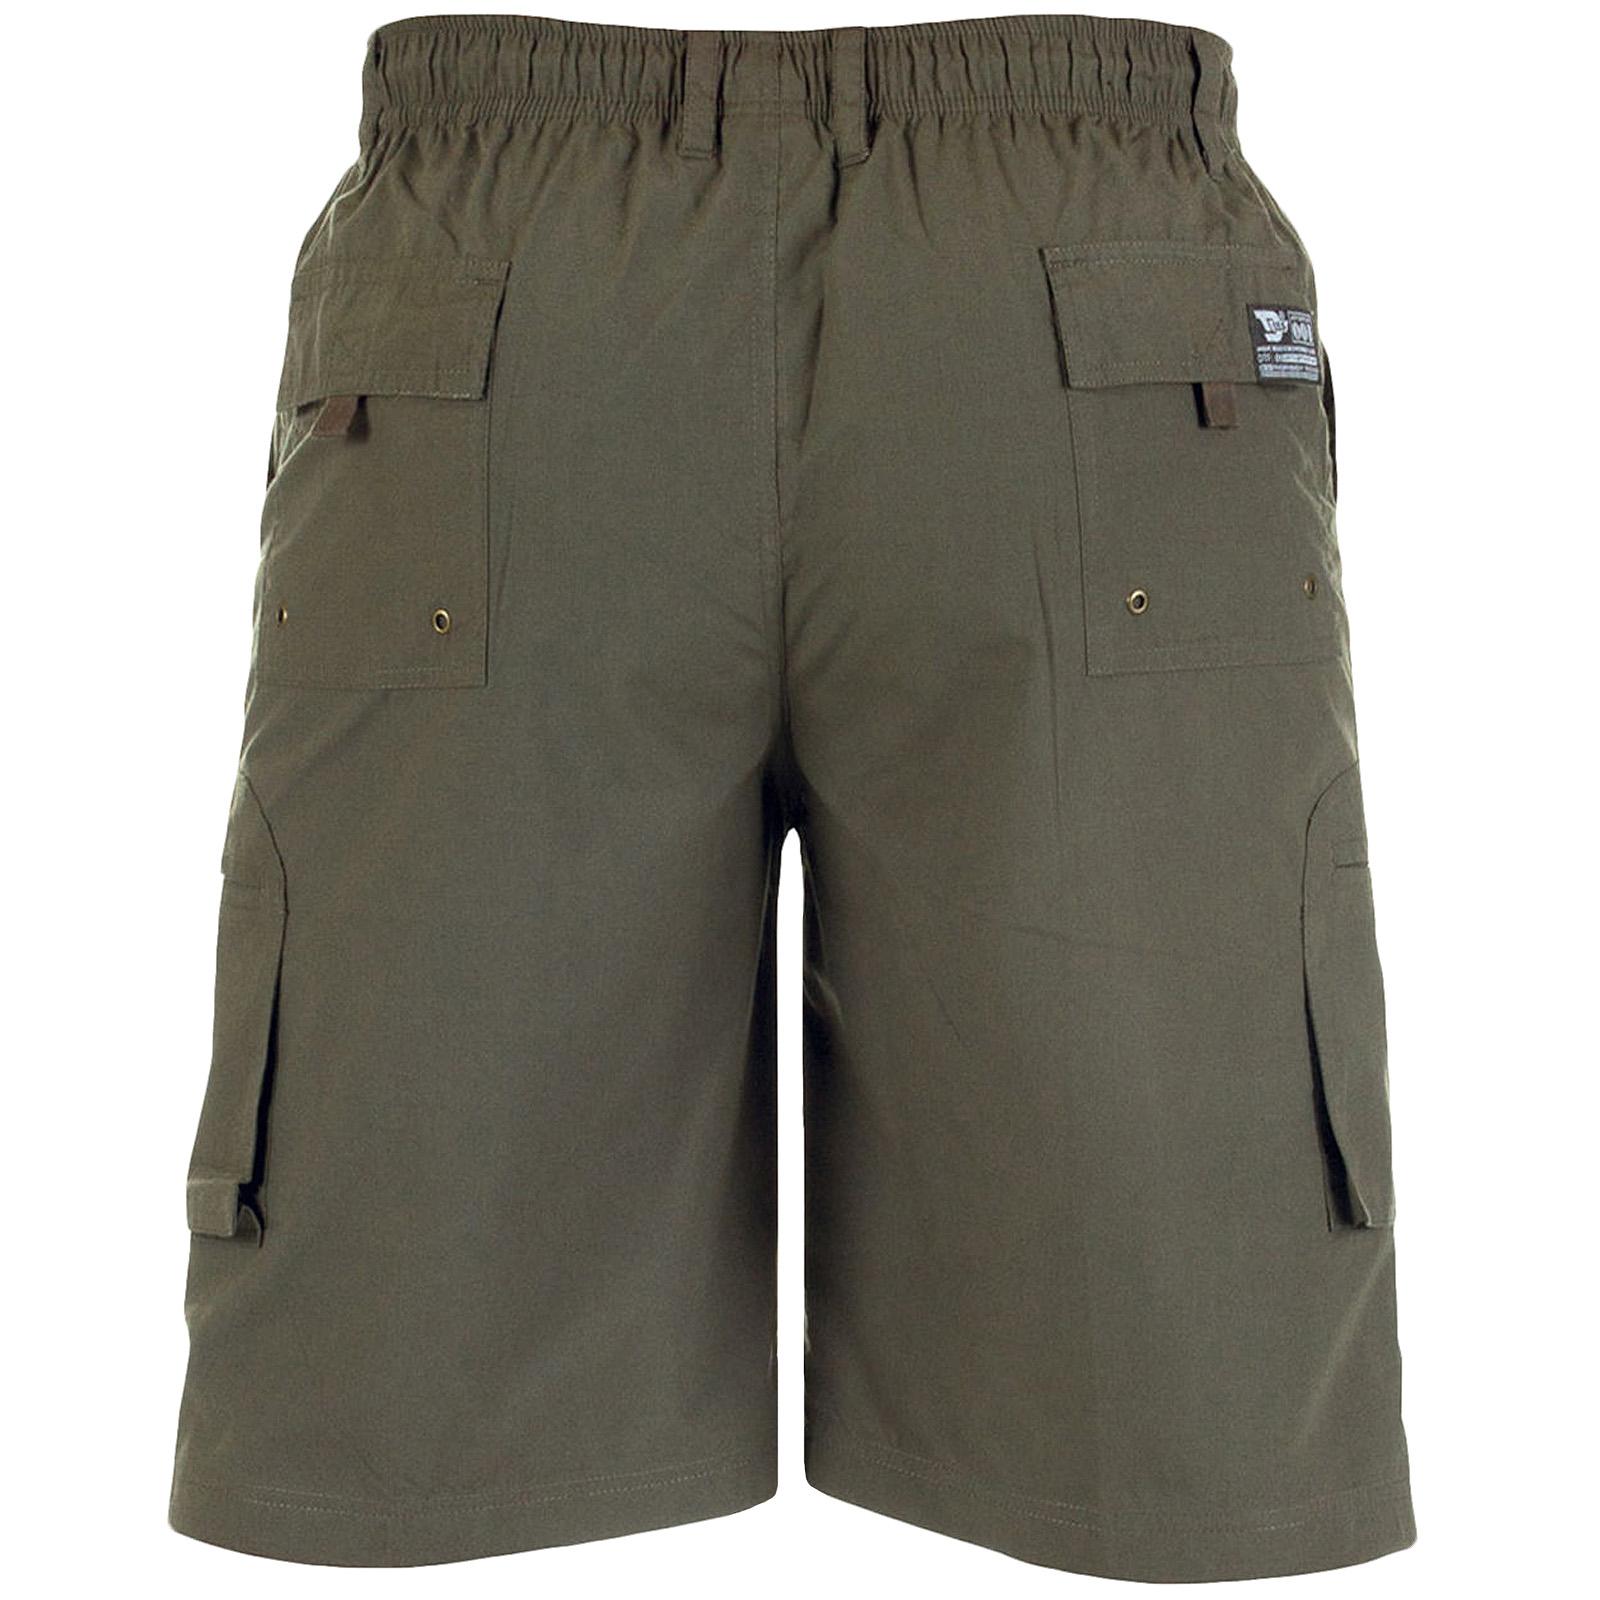 D555 Duke Mens Nick Big Tall King Size Summer Holiday Beach Cargo Bottoms Shorts